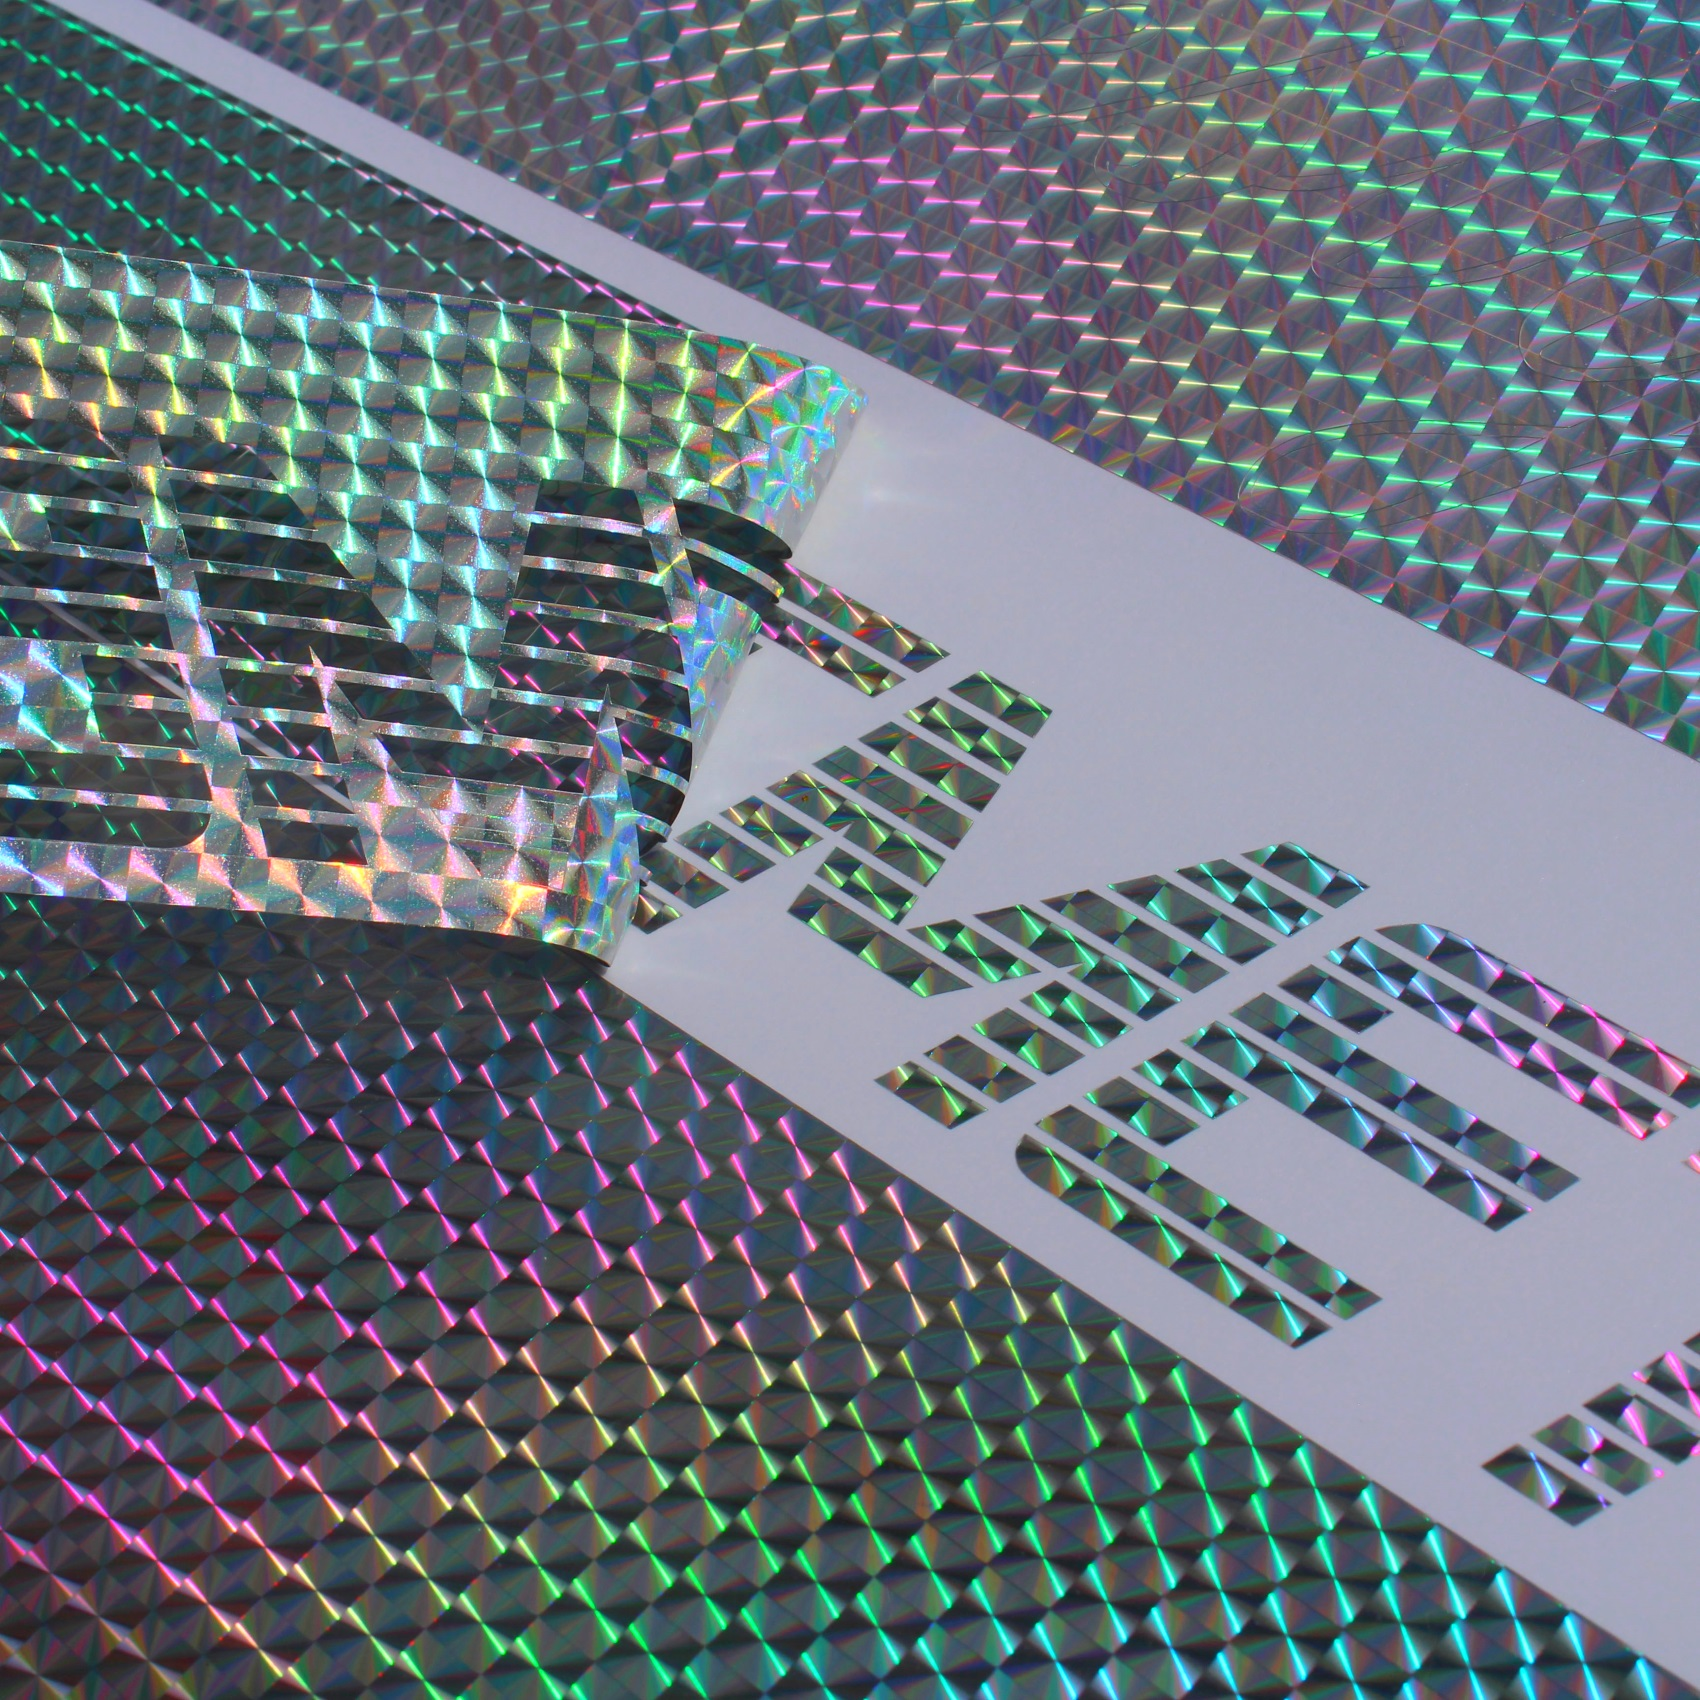 19-49-26-20-m-Plotterfolie-Hologramm-Oilslick-Folie-Aufkleber-Plottfolie Indexbild 41